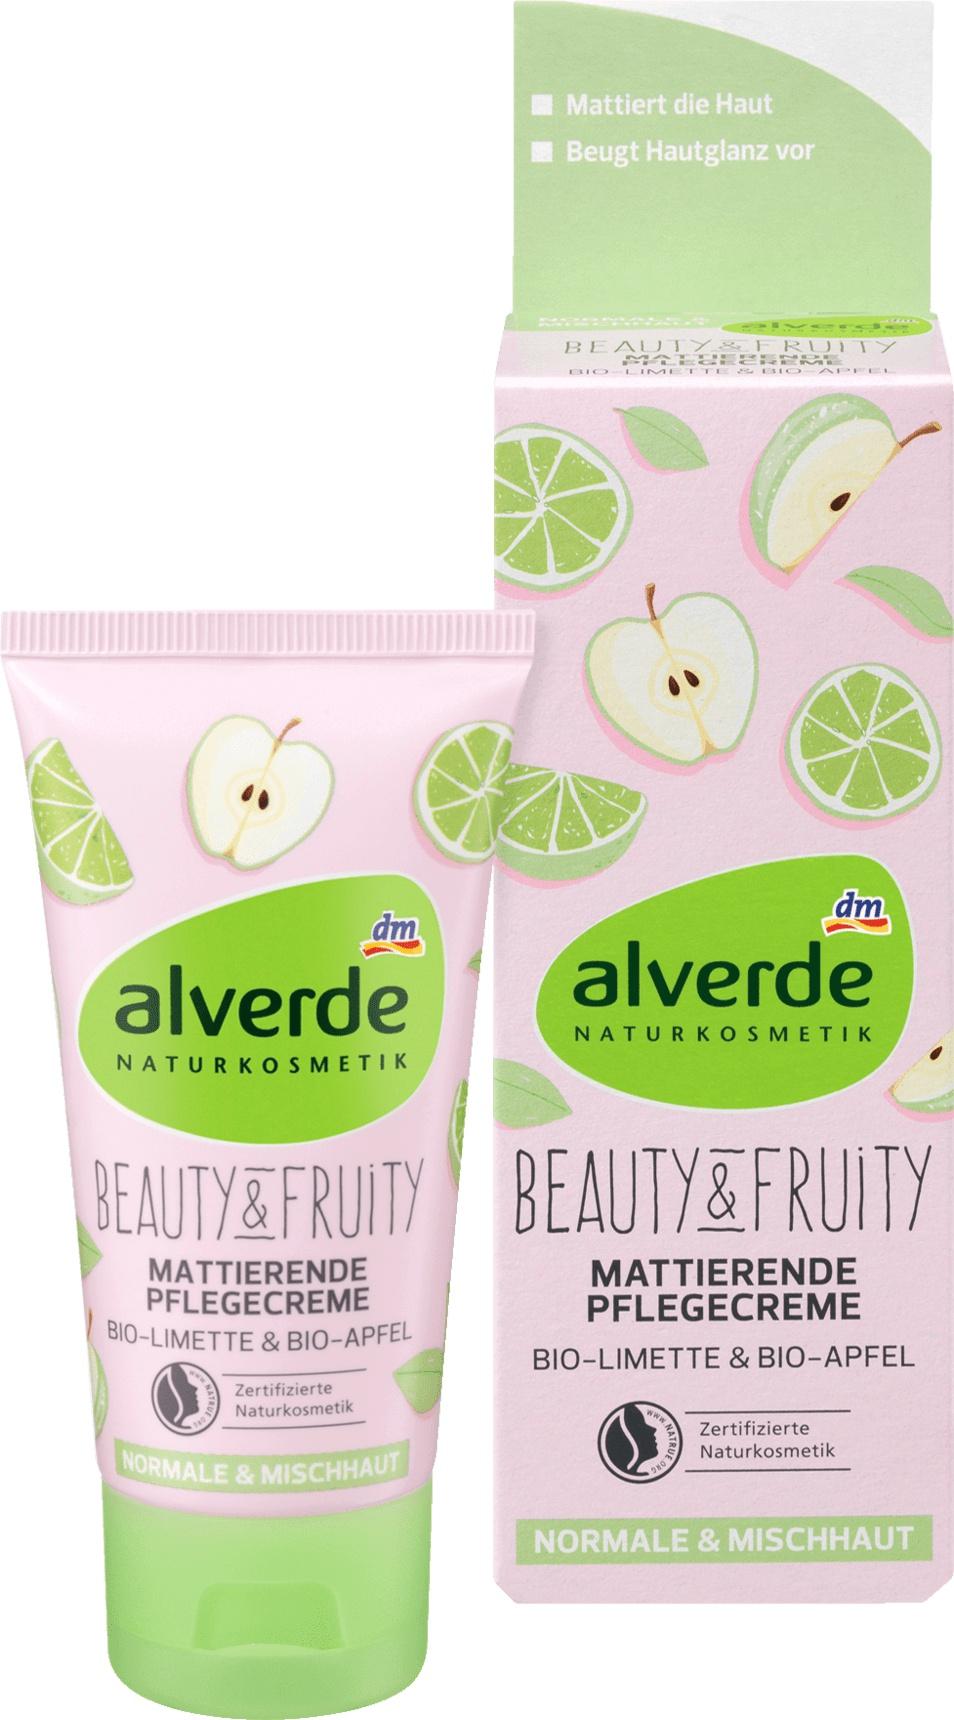 alverde Tagescreme Beauty & Fruity Mattierende Pflegecreme Bio-Limette Bio-Apfel